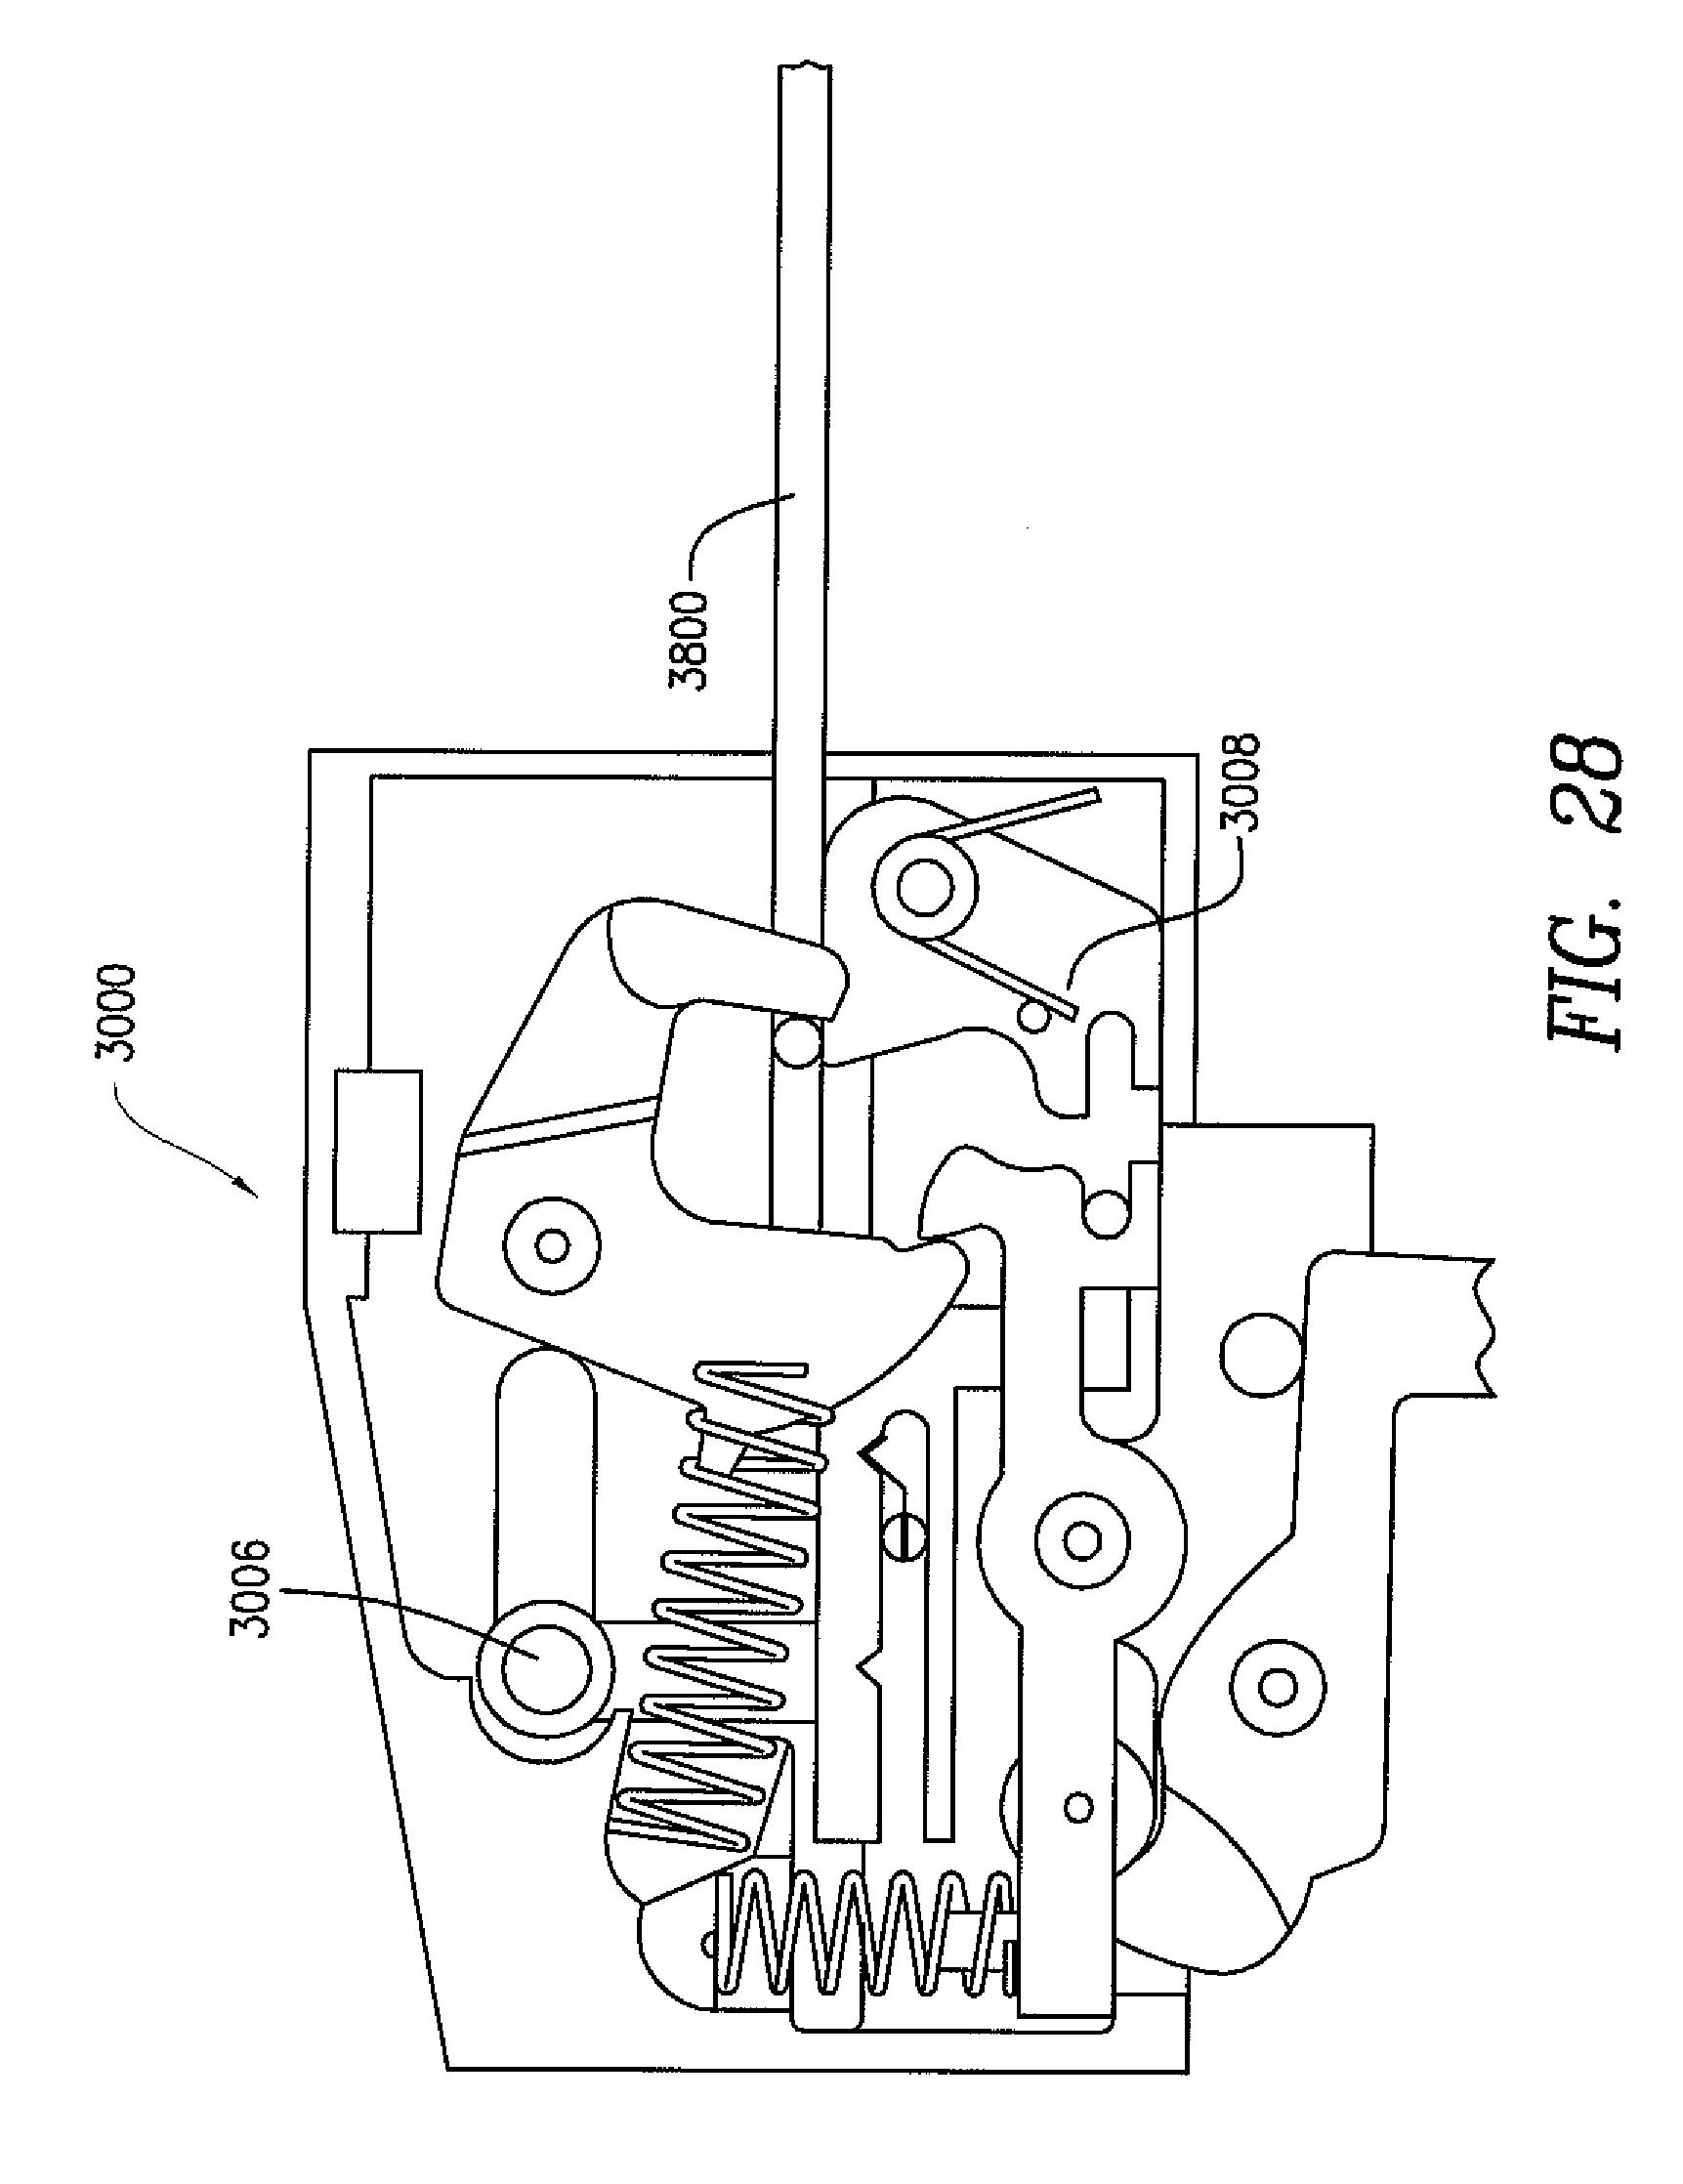 fuel pump fuses nissan 240sx deck lighting wiring diagram, Wiring diagram